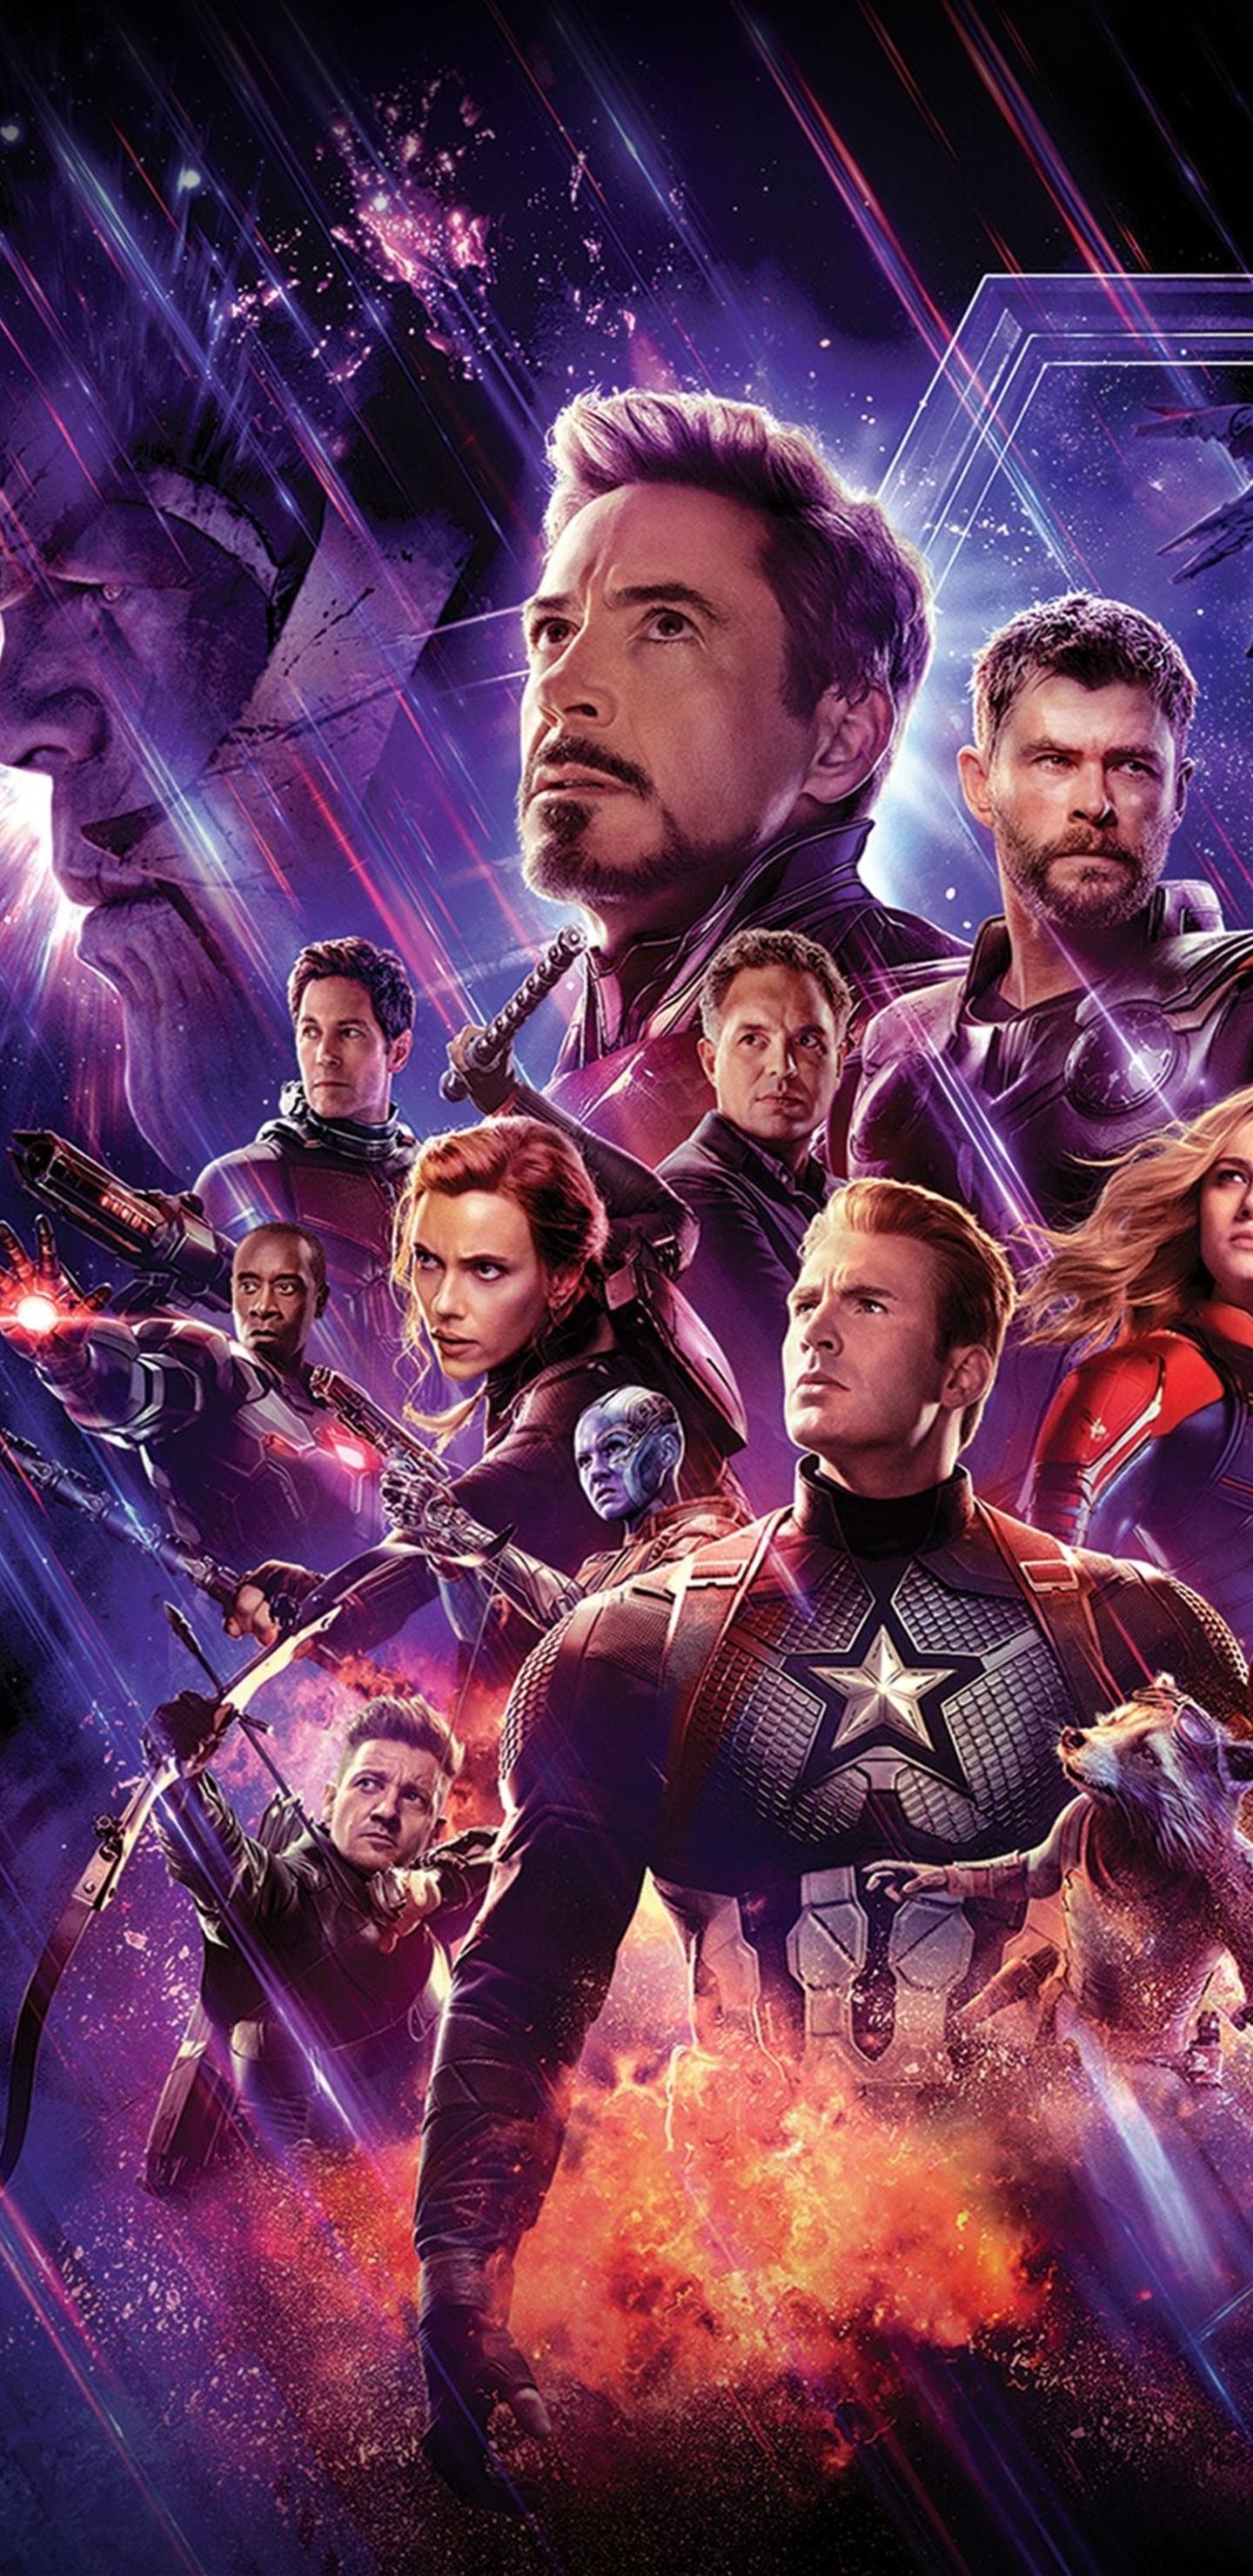 1440x2960 Disney Plus Avengers Endgame 4k Samsung Galaxy ...